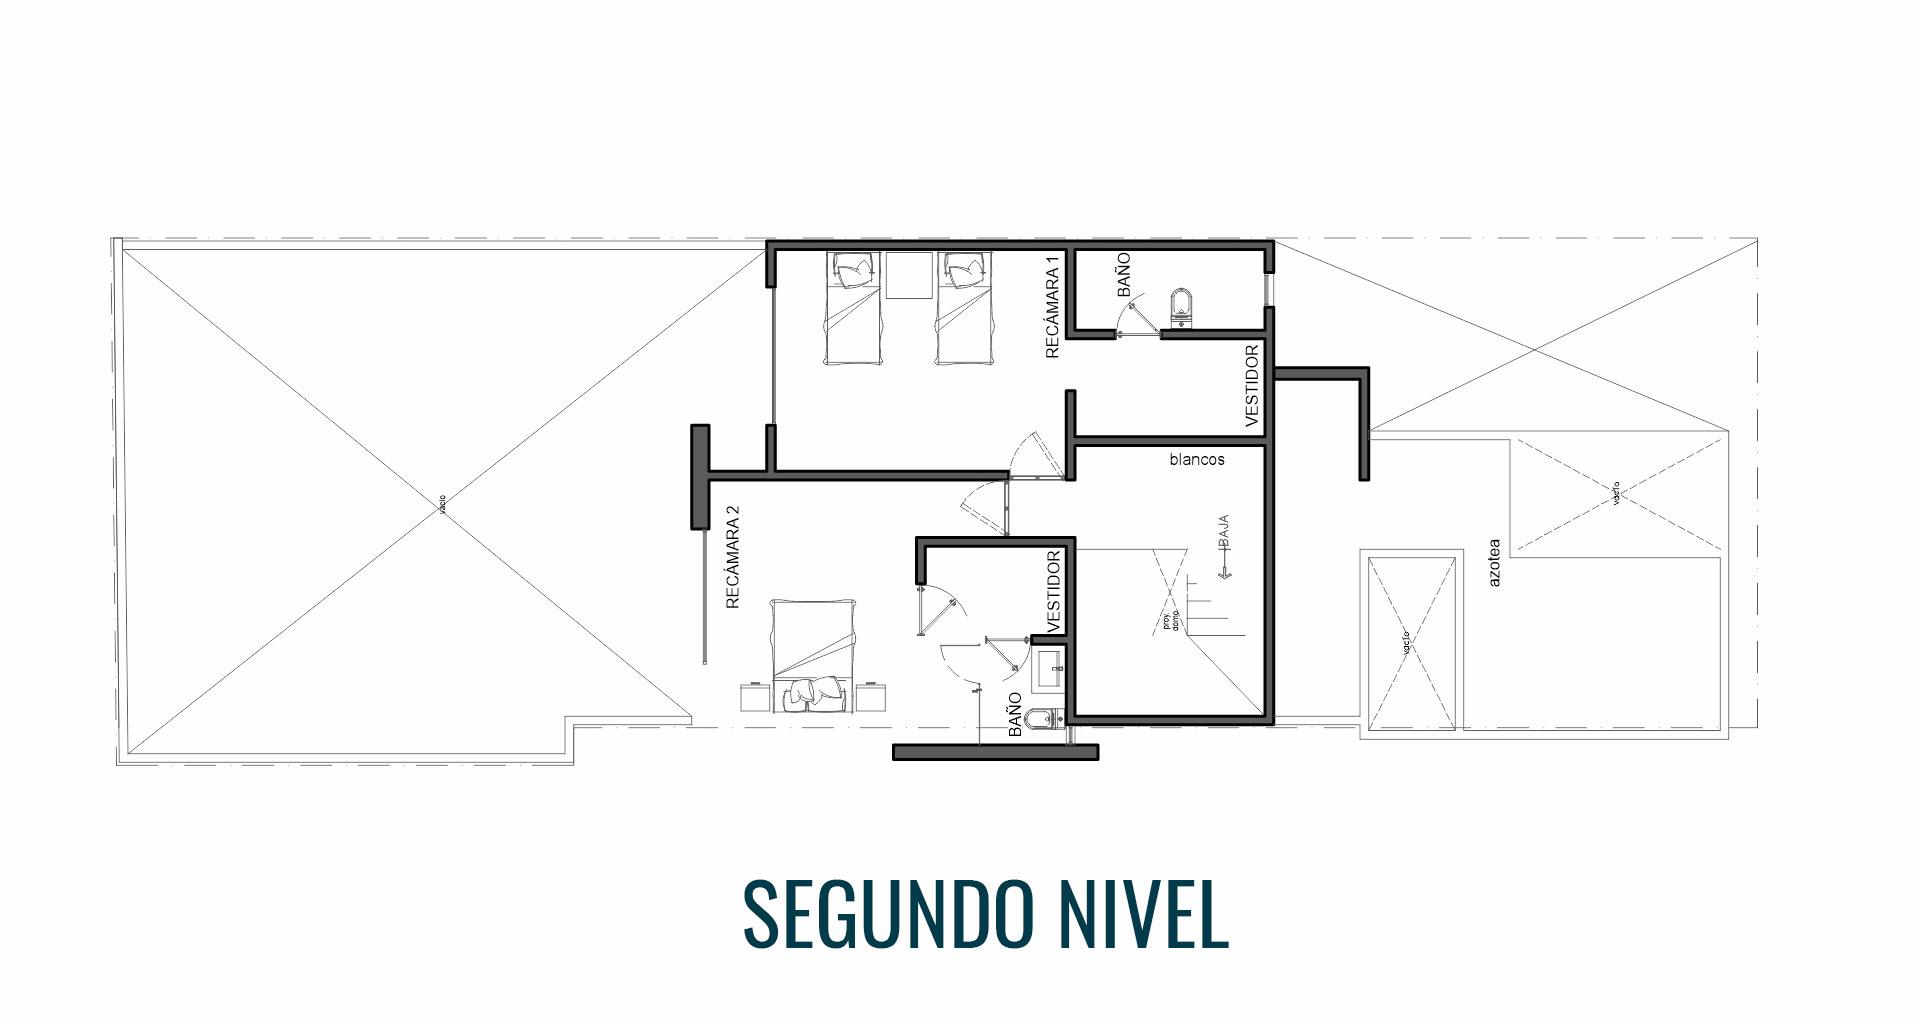 Margaritas 339 residencial Mexihom residencia 1 primer nivel